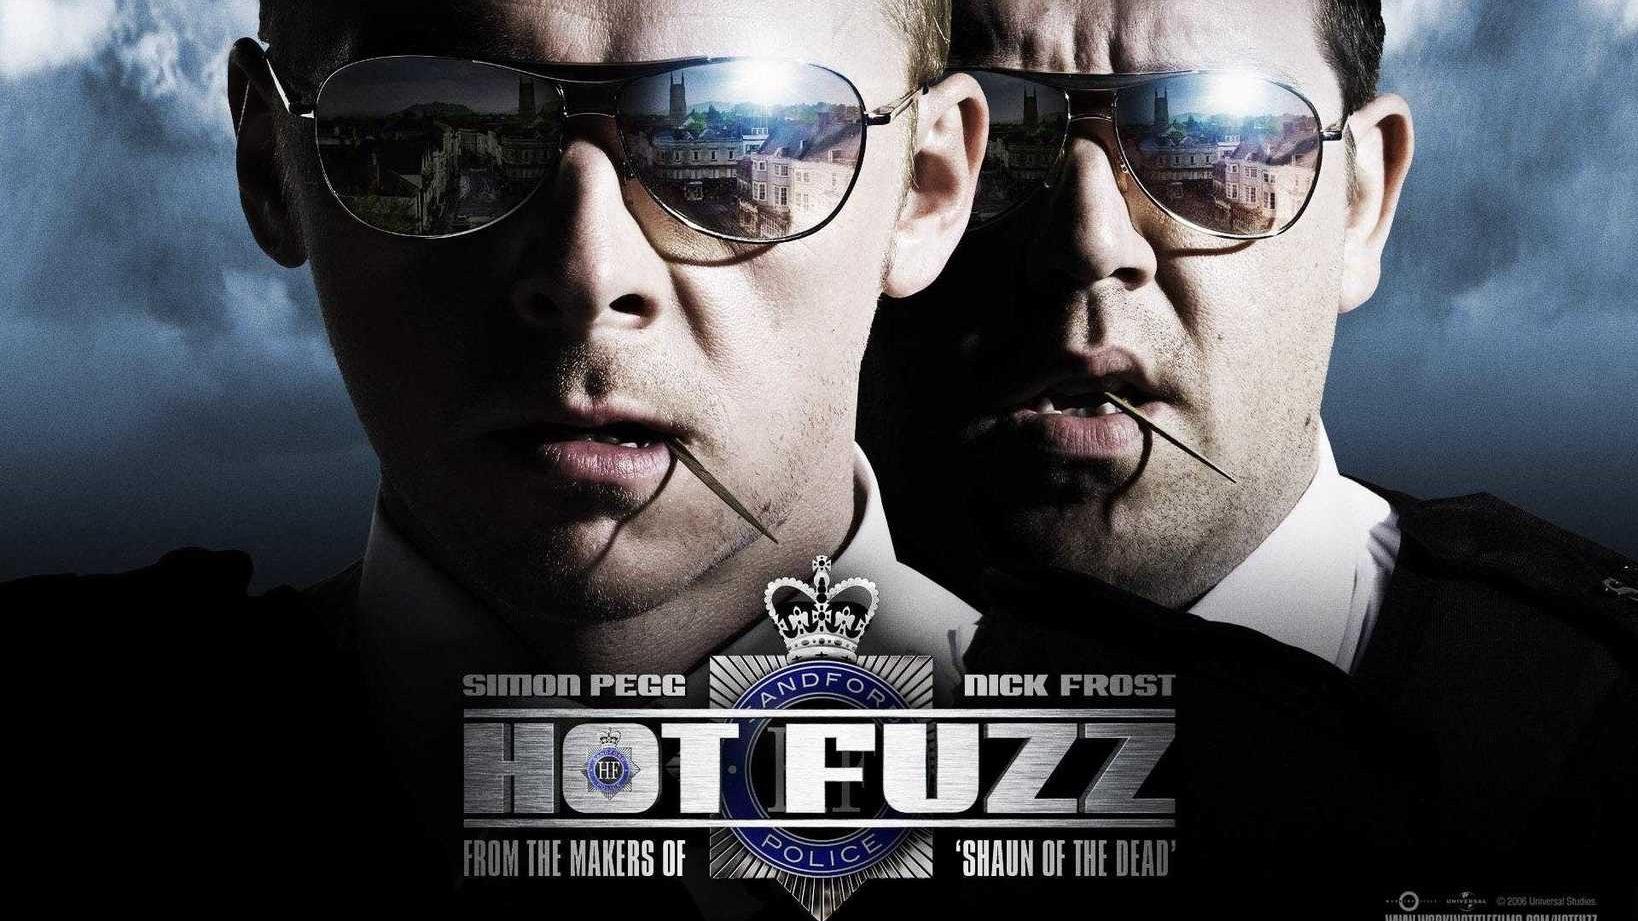 hot-fuzz-poster-e1487434552126